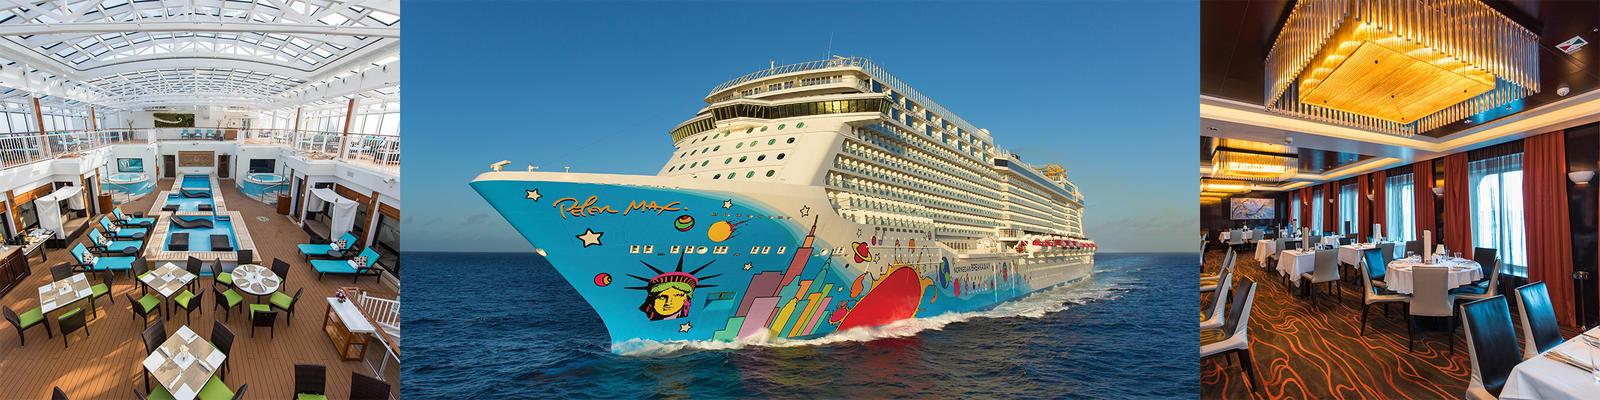 Norwegian Breakaway Cruise Ship Review Photos